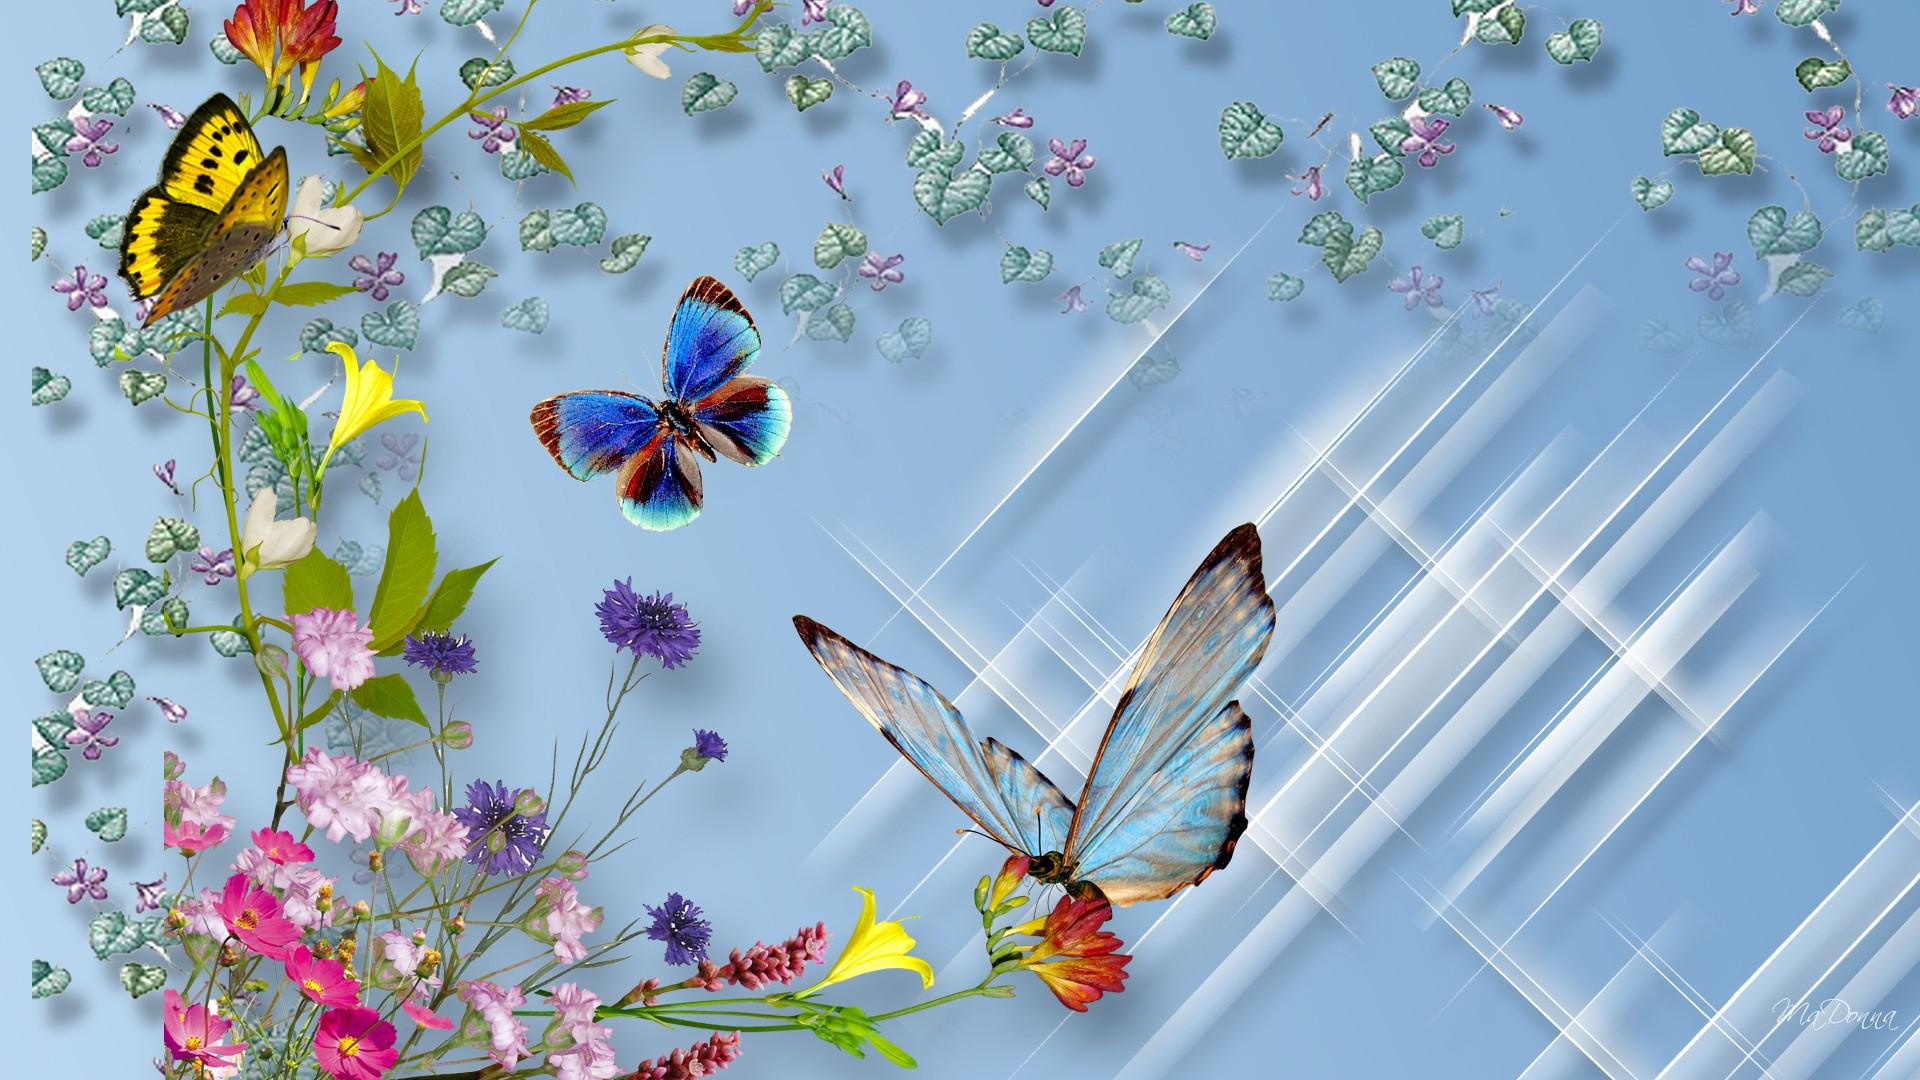 Hd Wallpaper Download Butterfly 1920x1080 Wallpaper Teahub Io